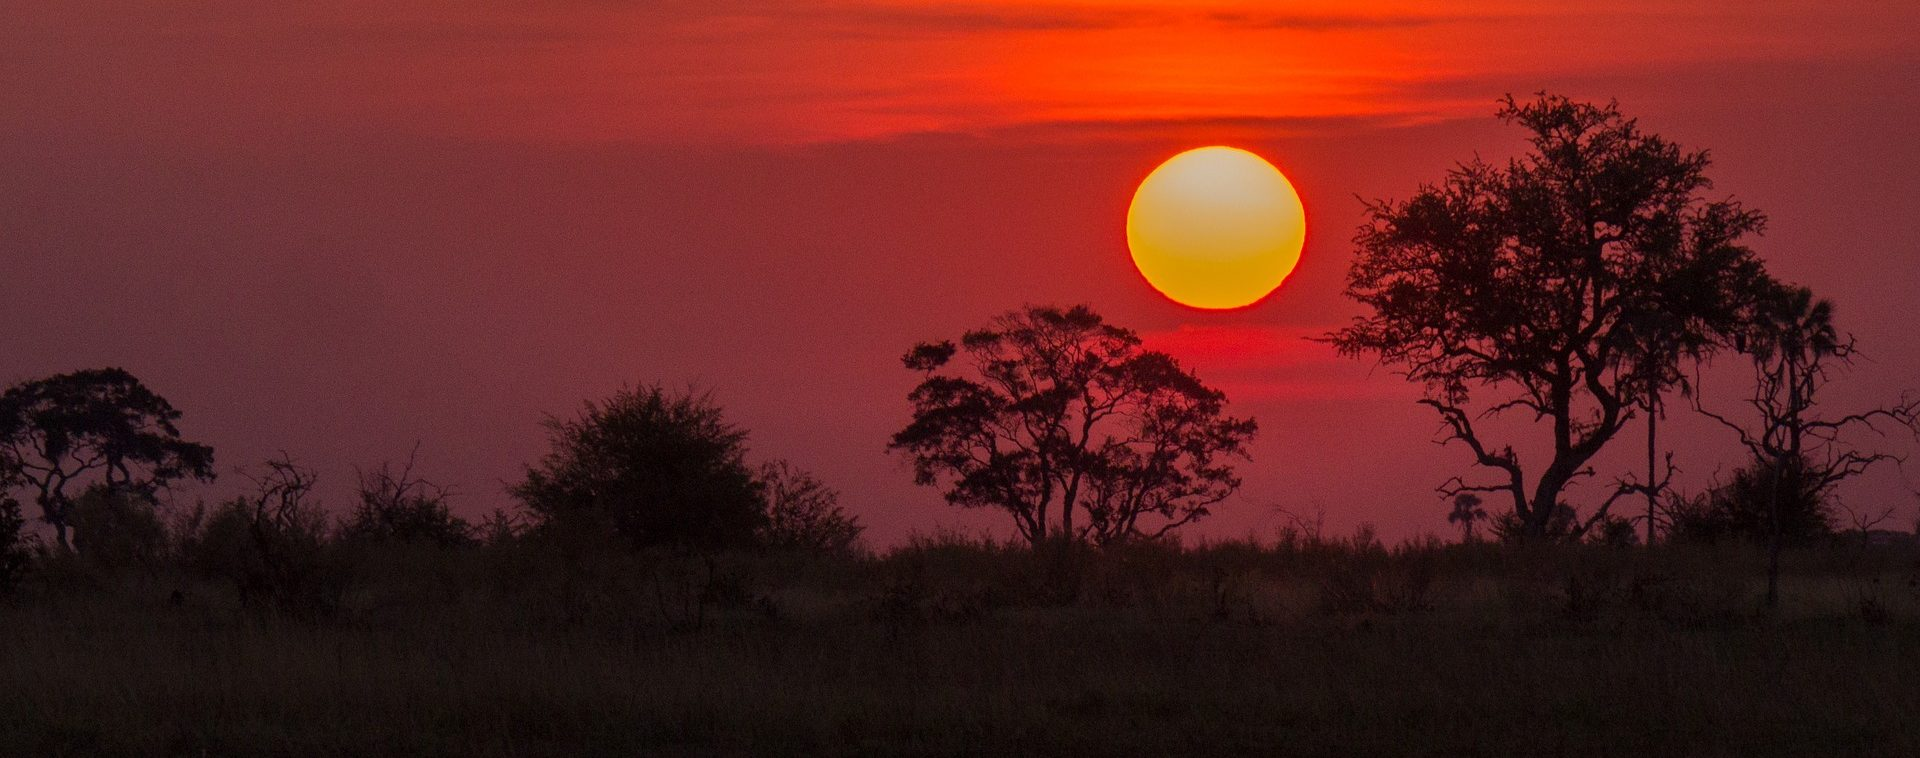 Botswana - Les Matins du Monde